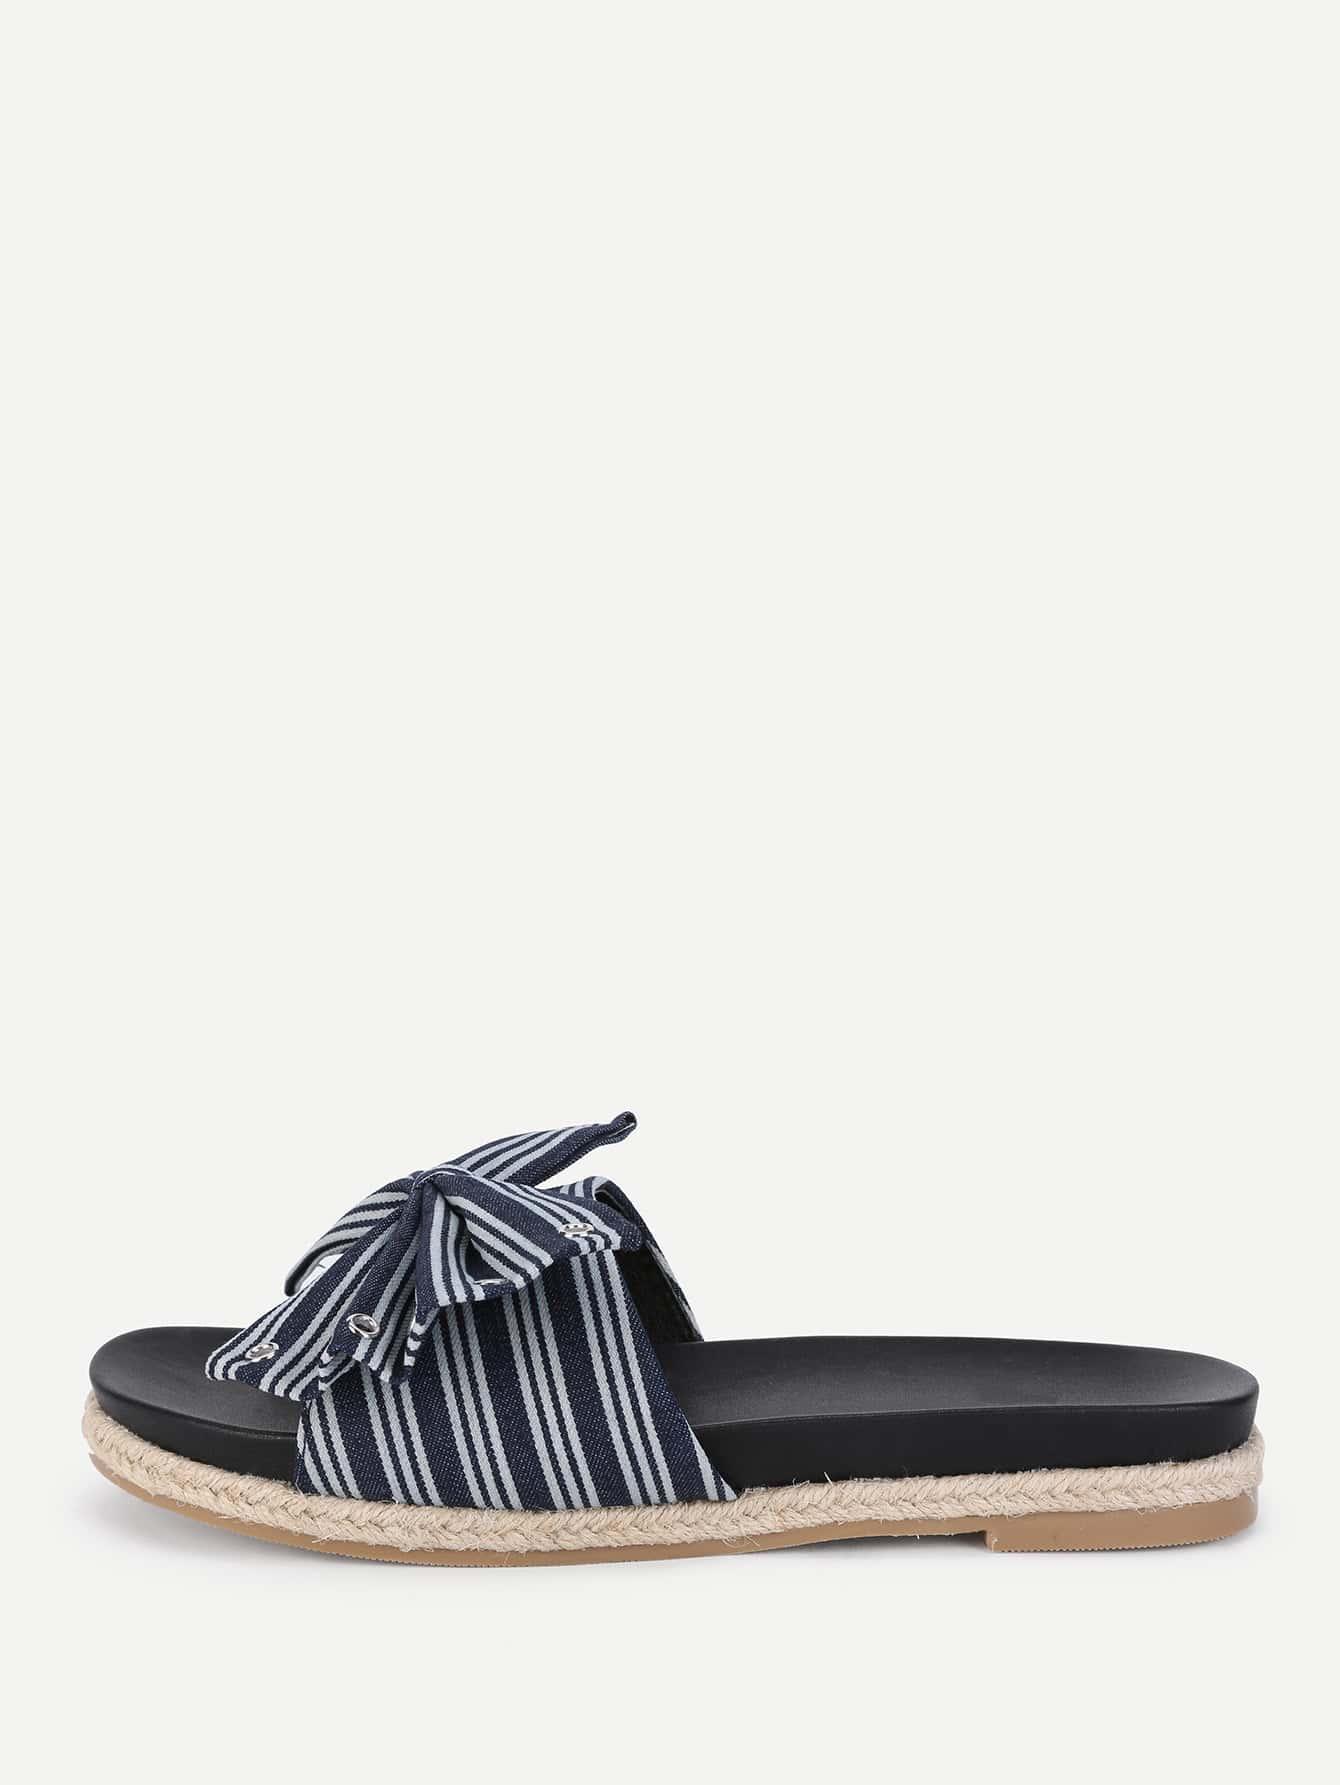 Bow Design Striped Flat Sandals